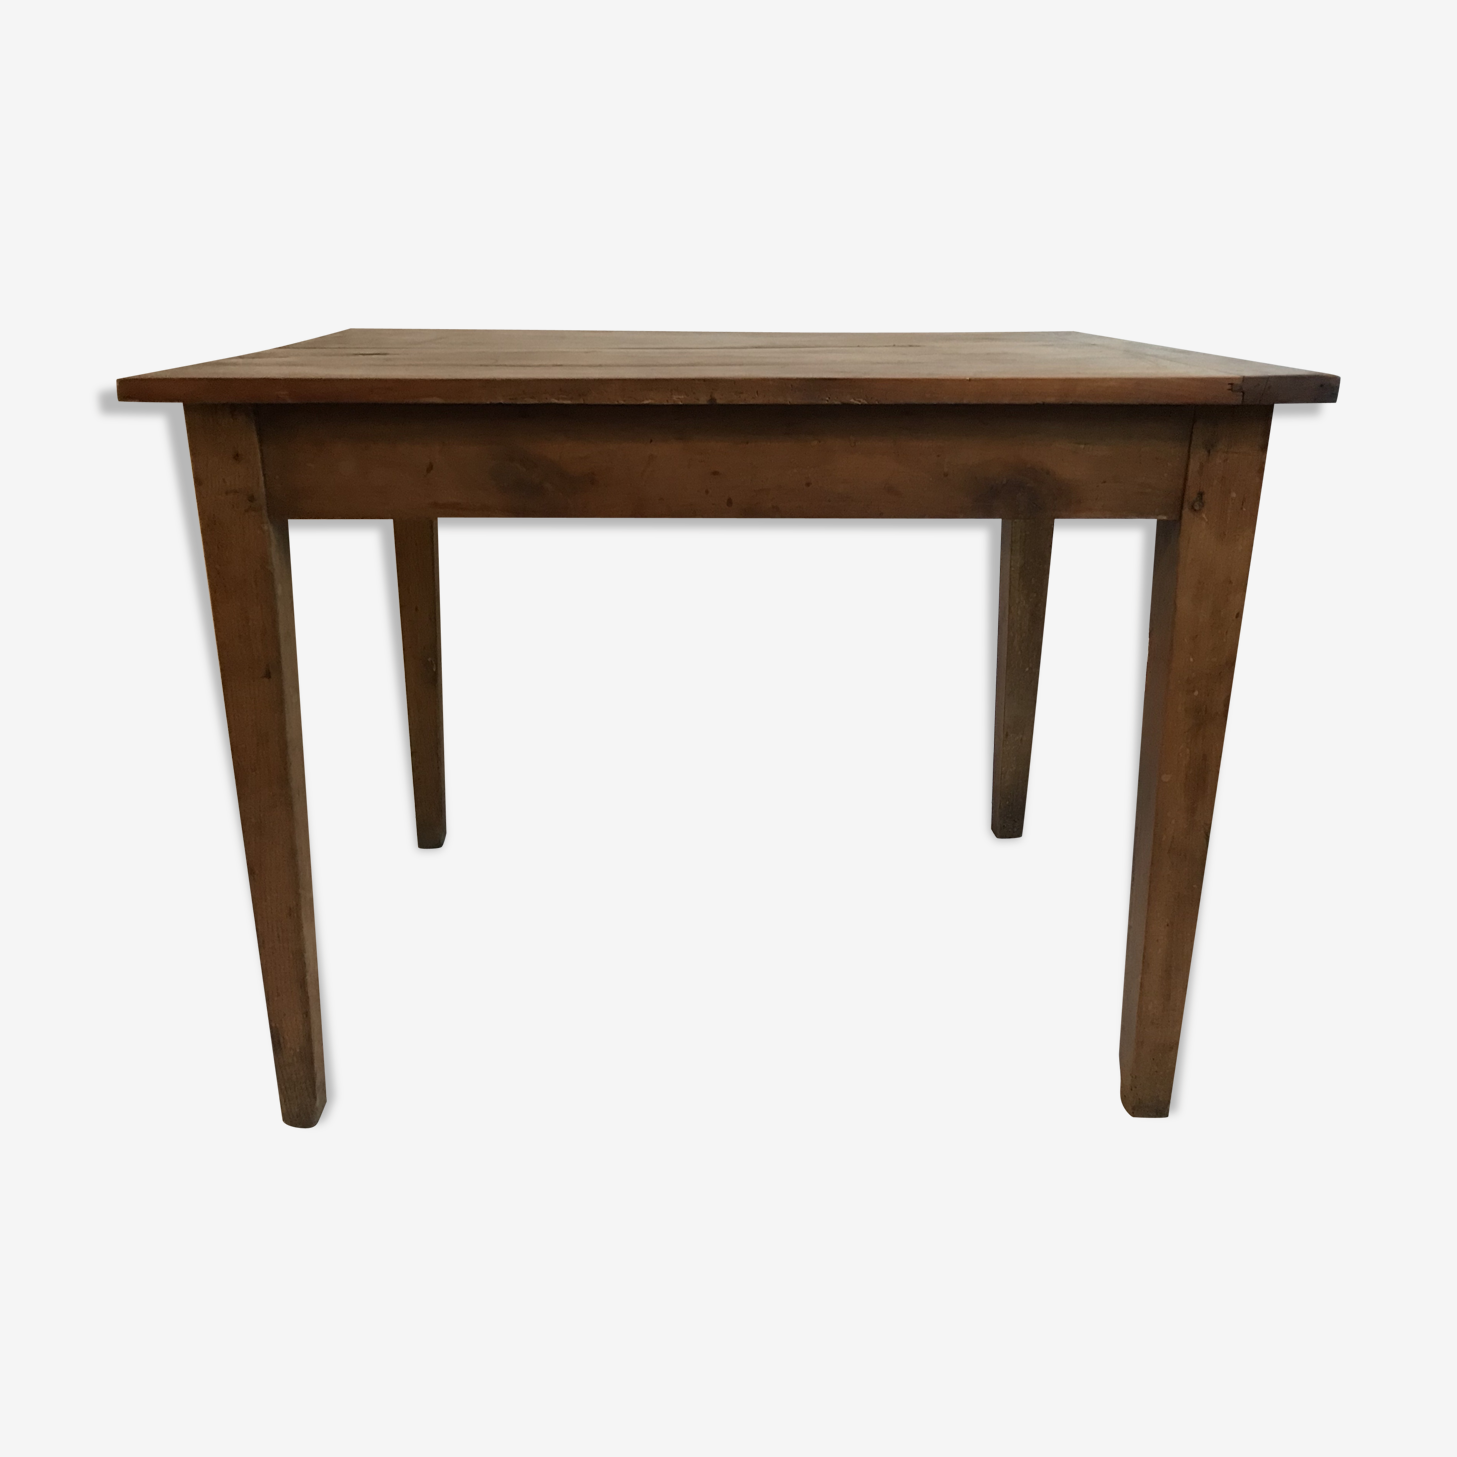 Table de ferme en bois massif